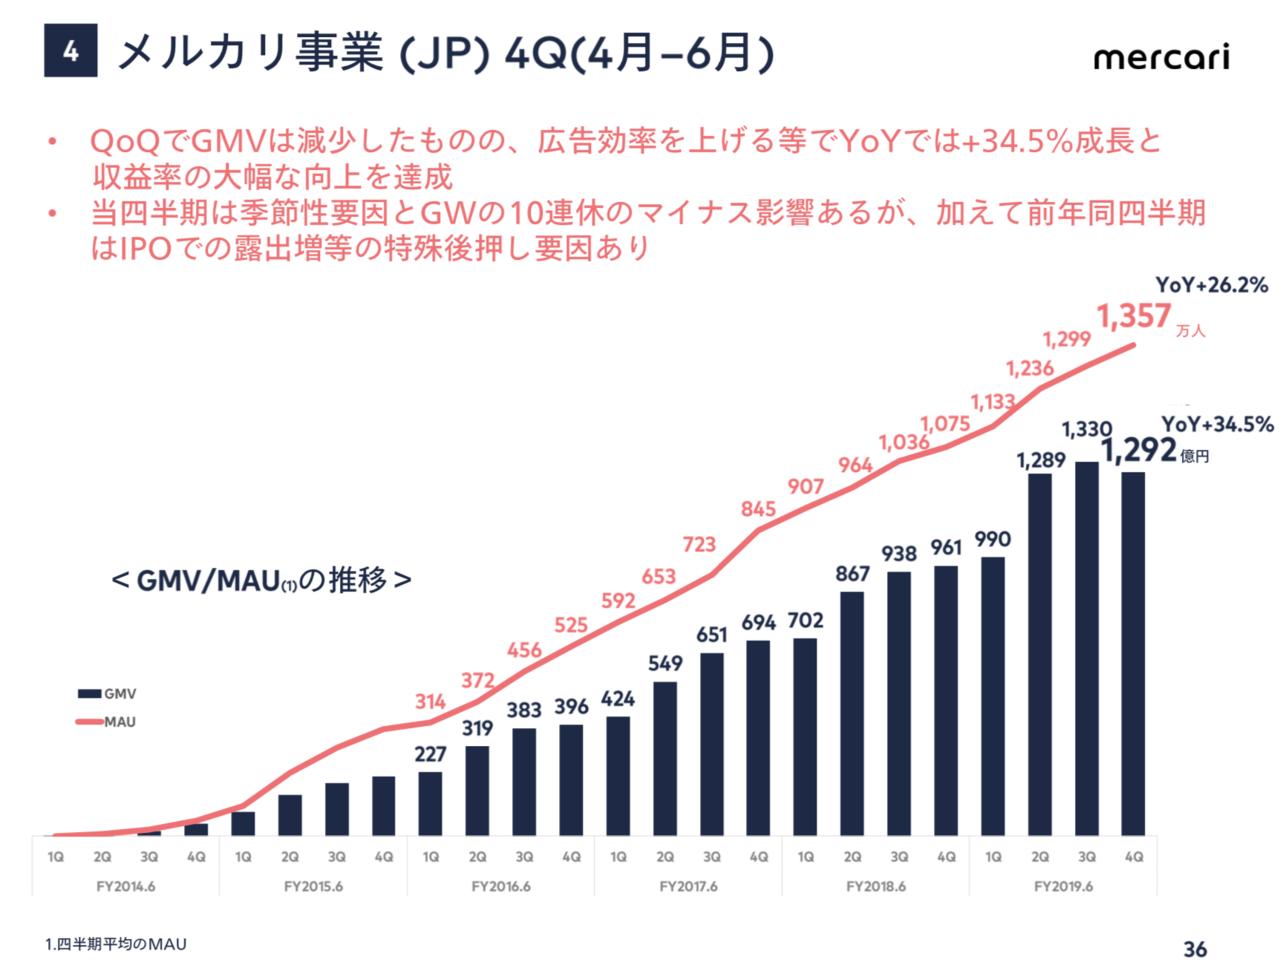 出典:株式会社メルカリ FY2019.6 4Q 決算説明会資料(2019年8月)